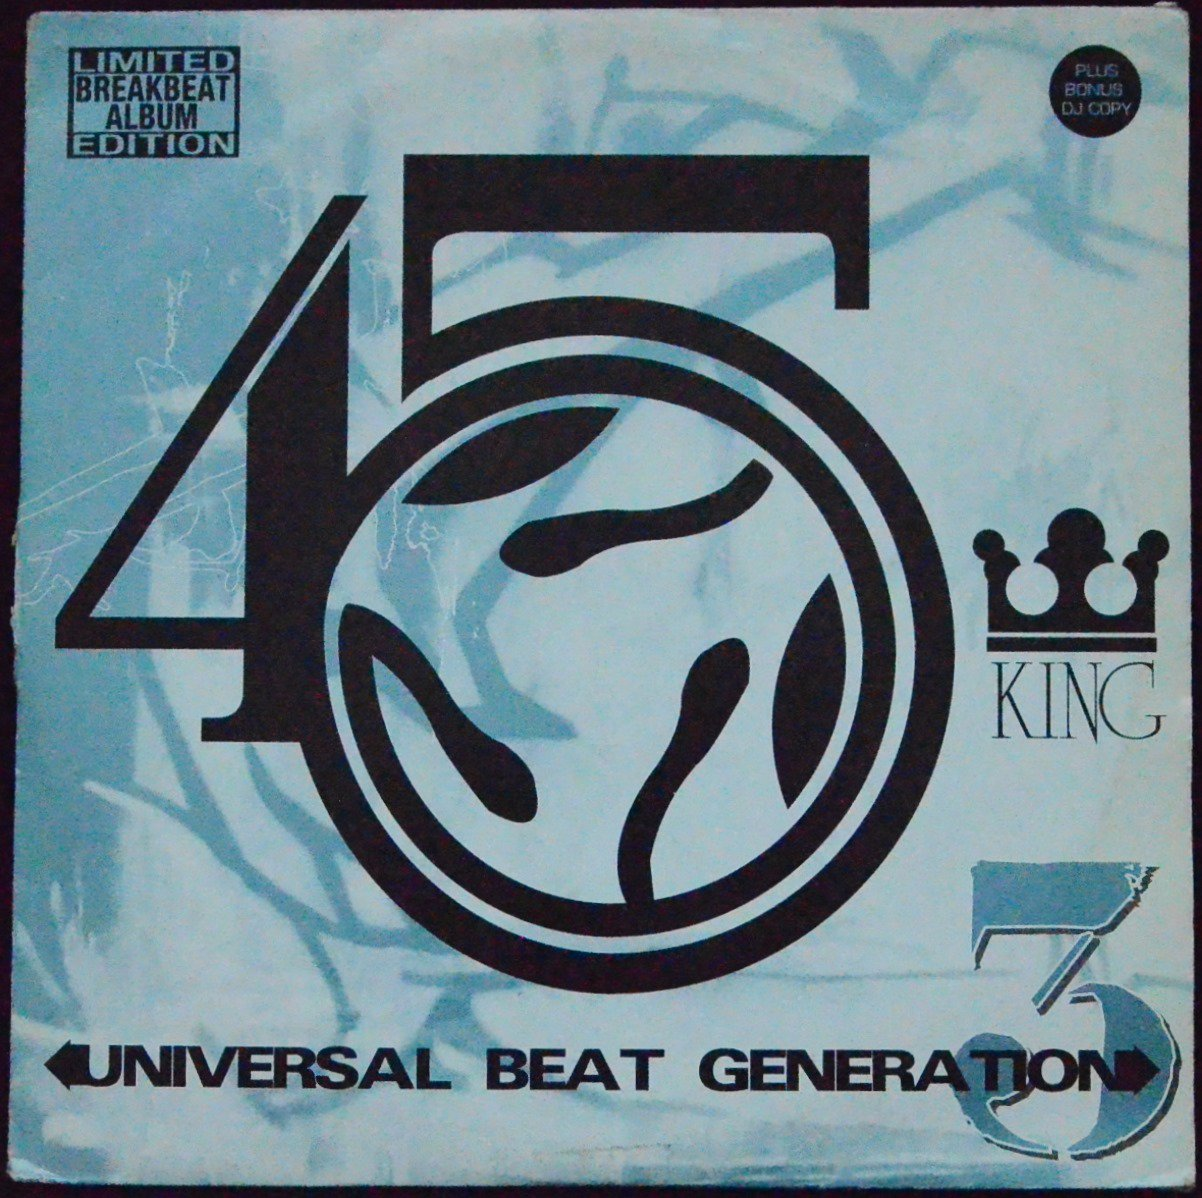 THE 45 KING / UNIVERSAL BEAT GENERATION 3 (2LP)